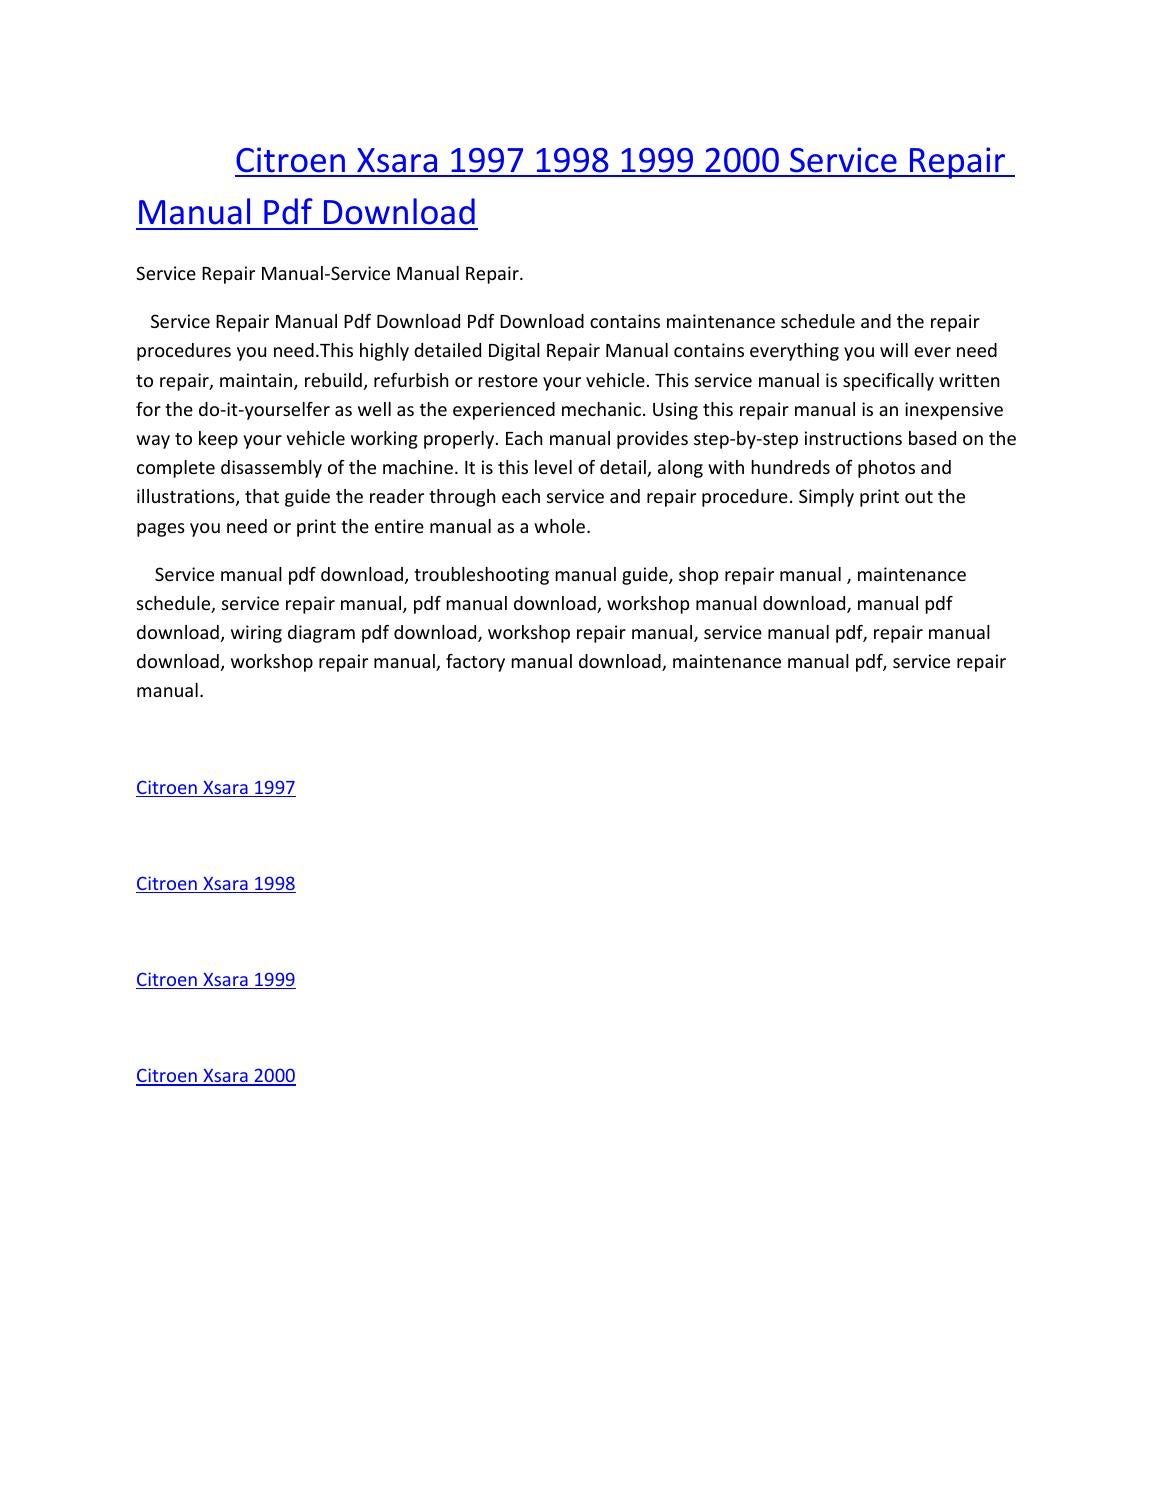 Citroen xsara 1997 1998 1999 2000 service manual repair pdf download by  amurgului - issuu